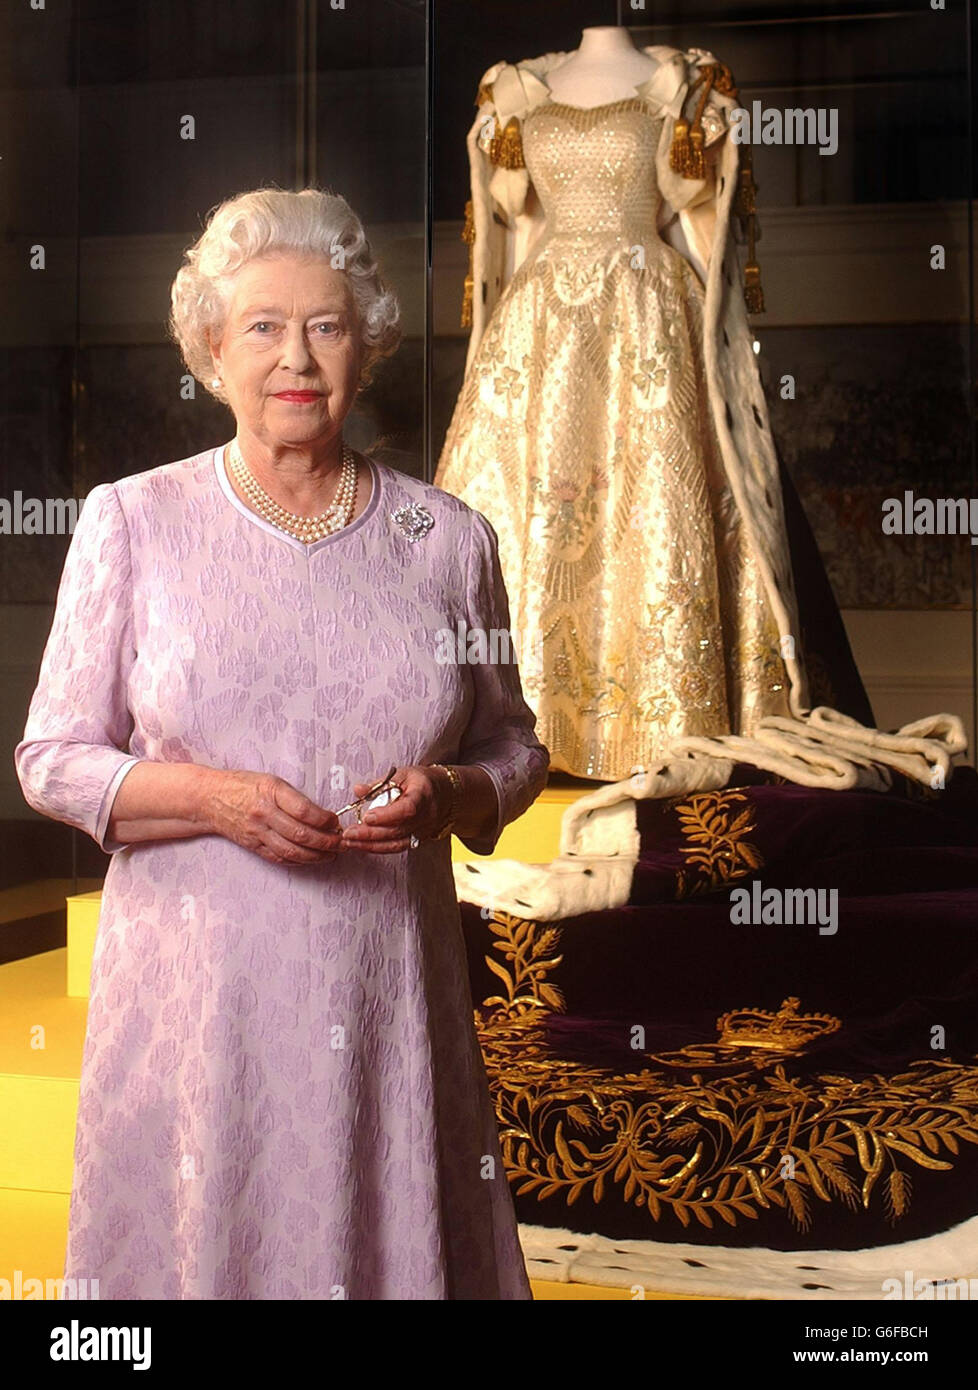 Elizabeth Coronation Dress Stock Photos & Elizabeth Coronation Dress ...